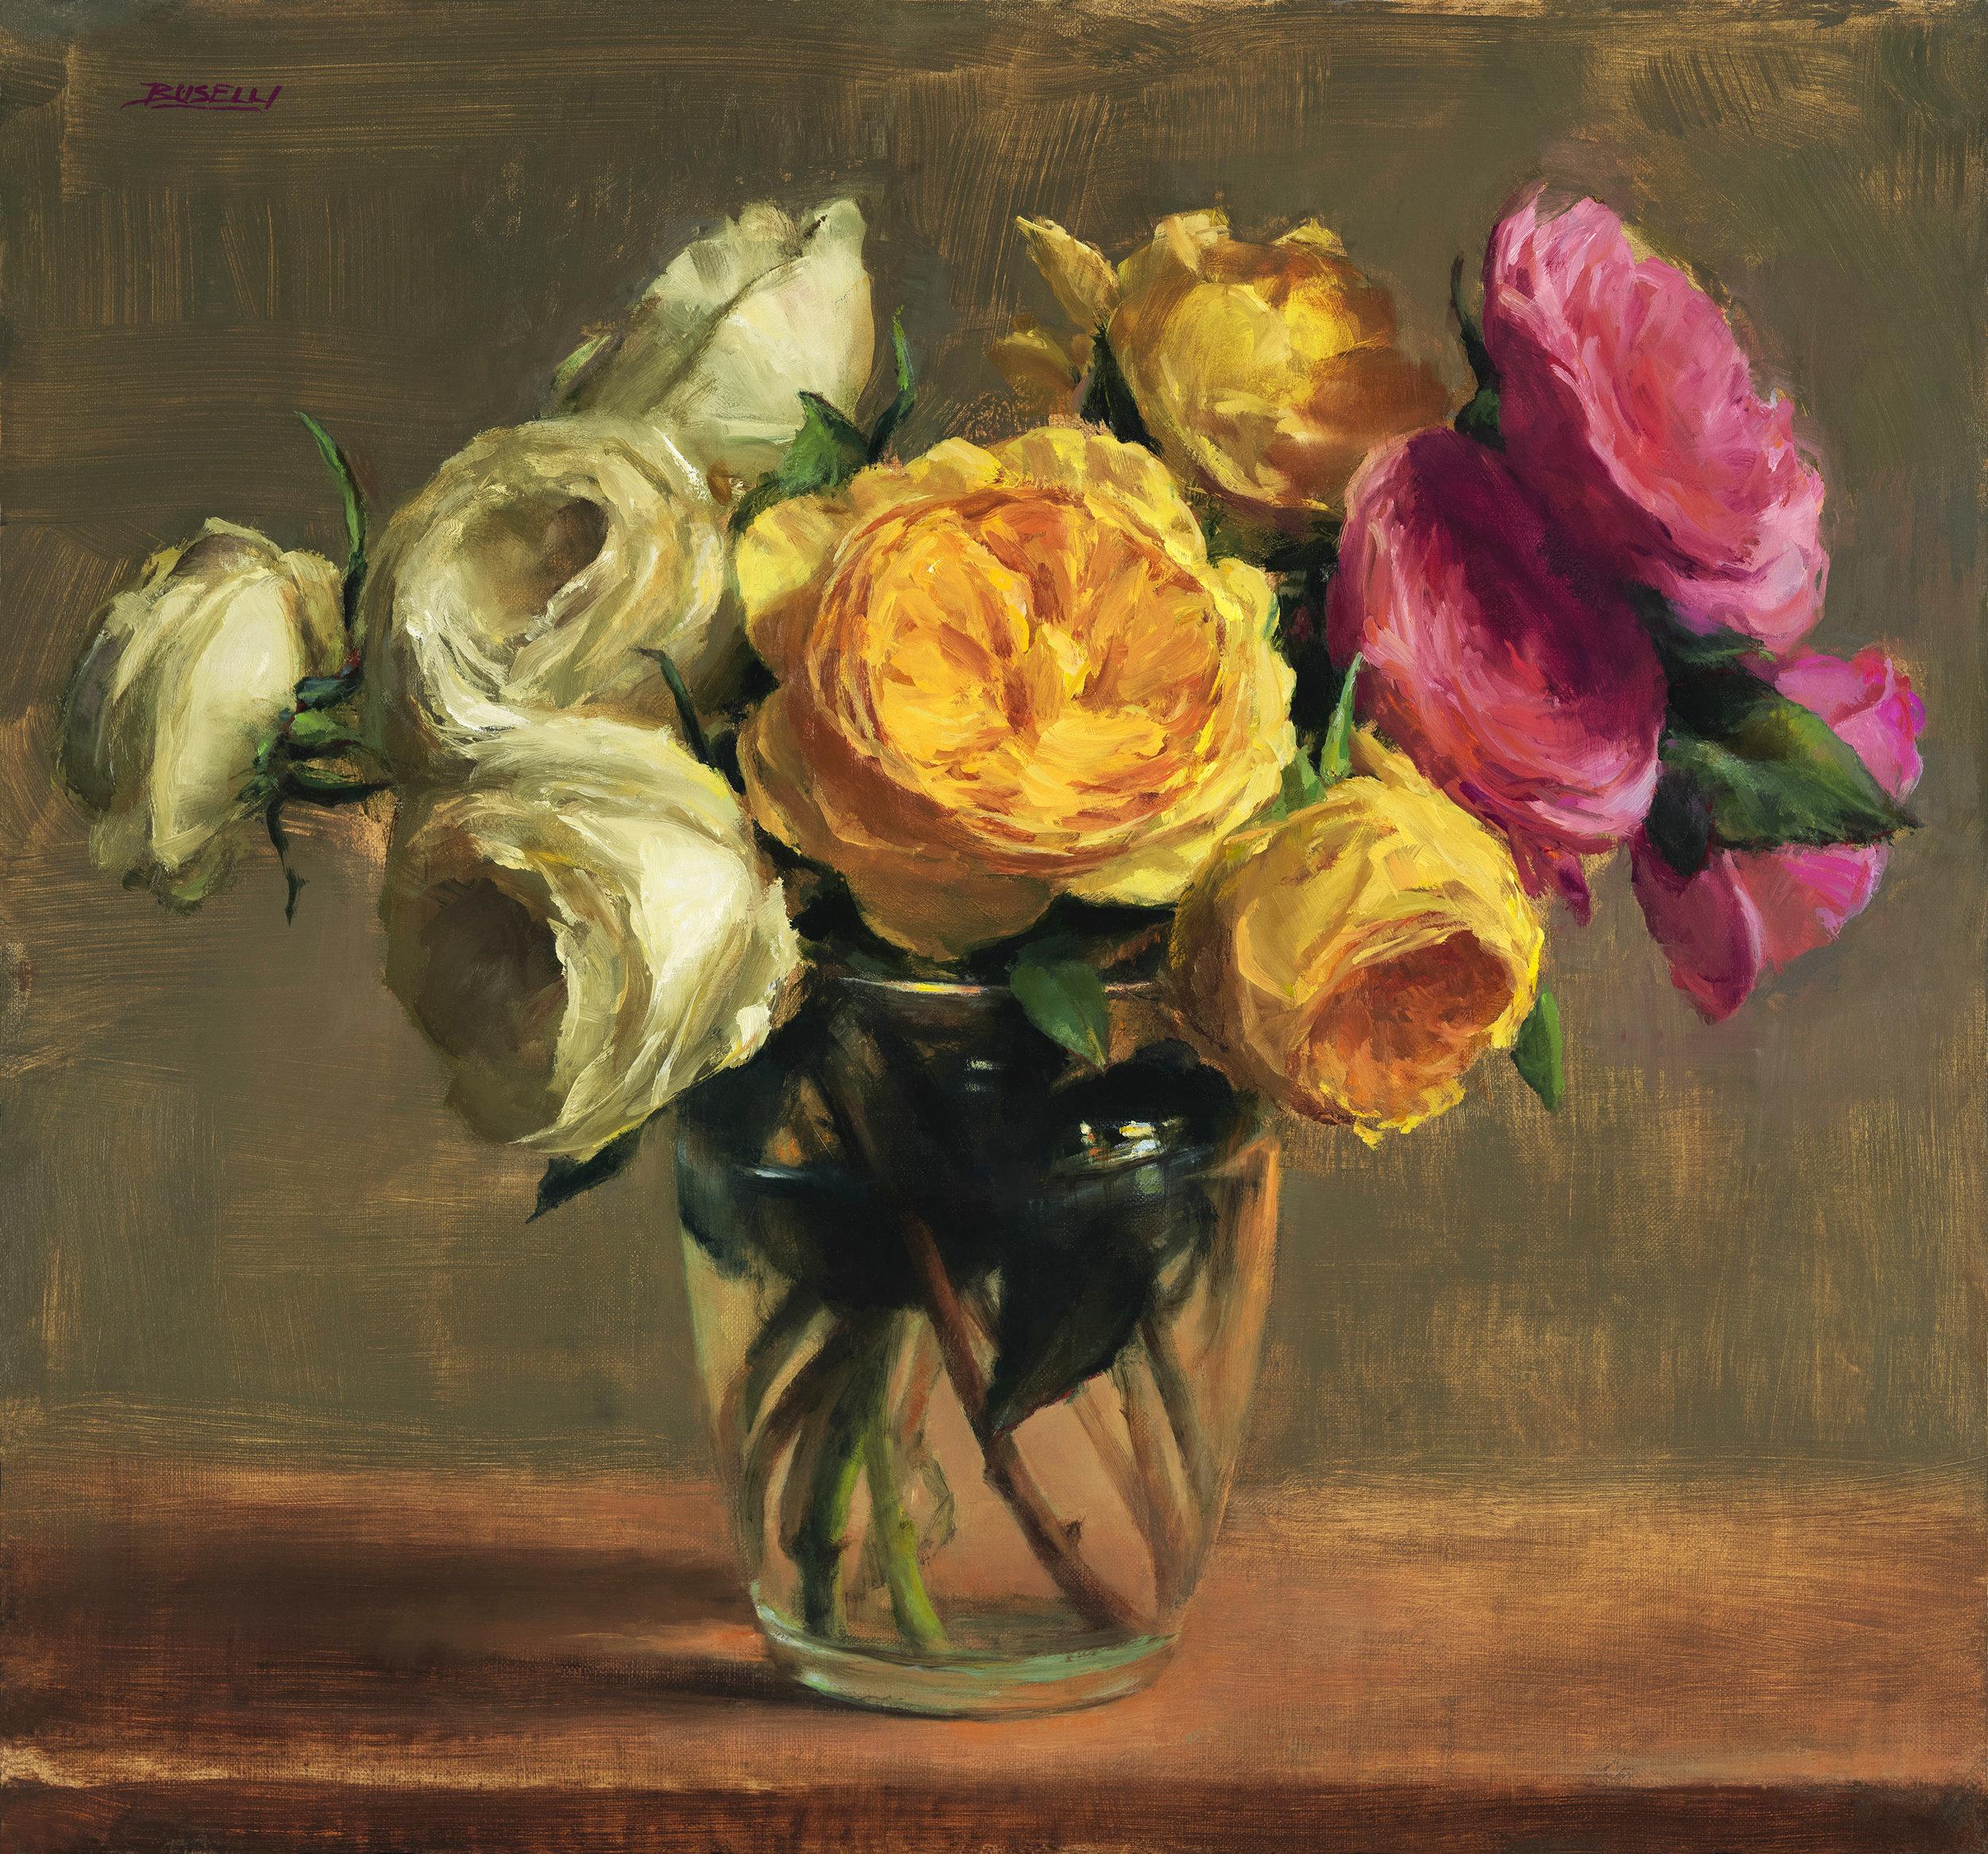 'DAVID AUSTEN ROSES' - oil on linen - 15' x 16'